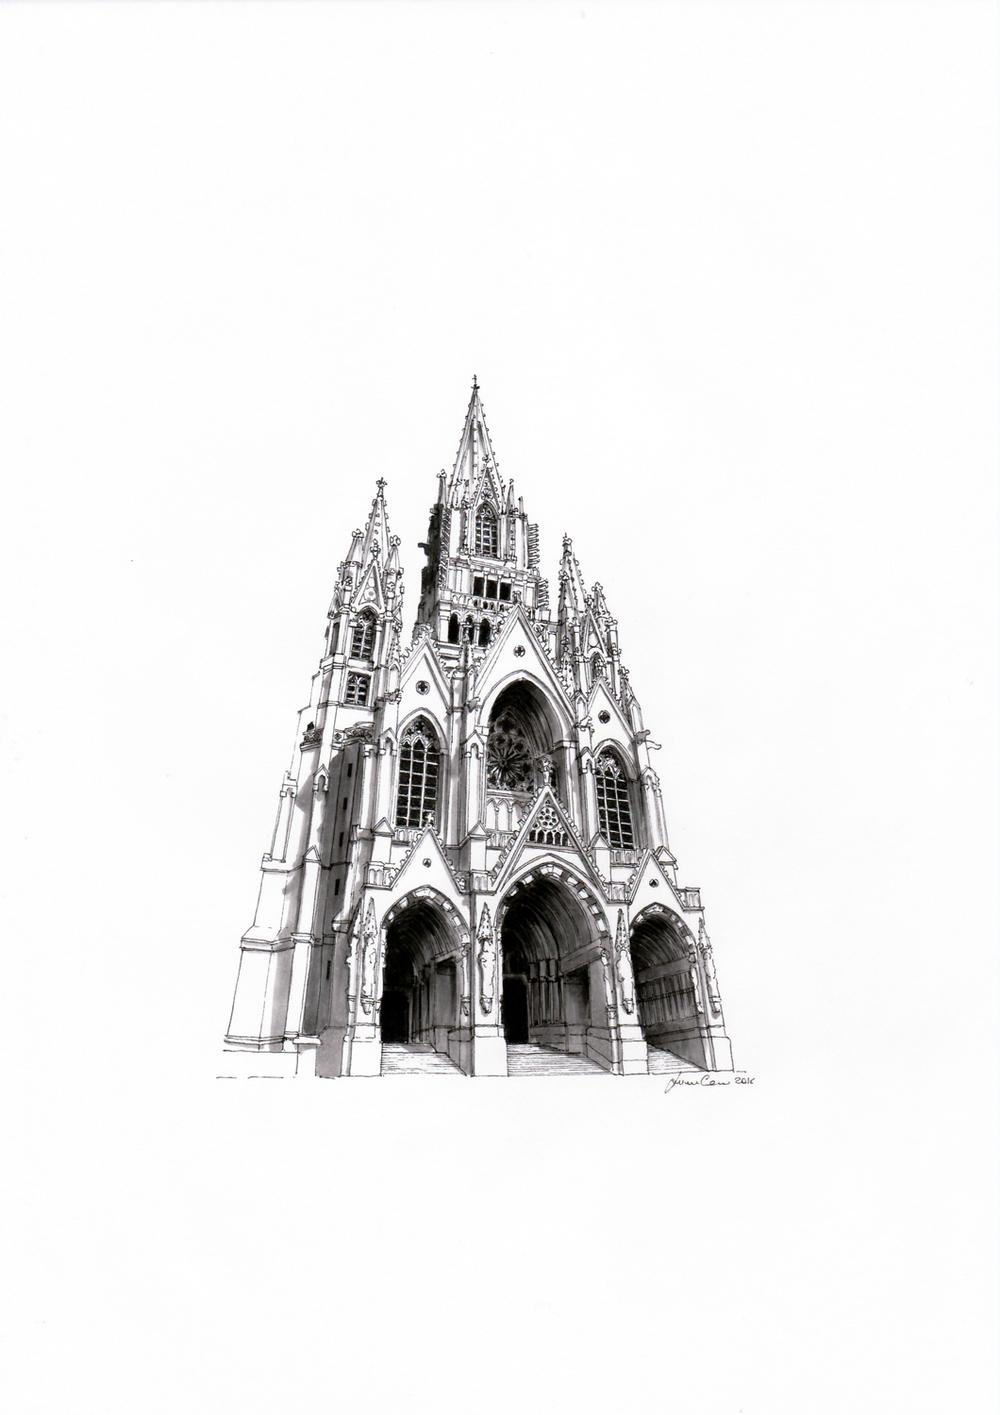 Chiesa di Nostra Signora di Laeken - Bruxelles